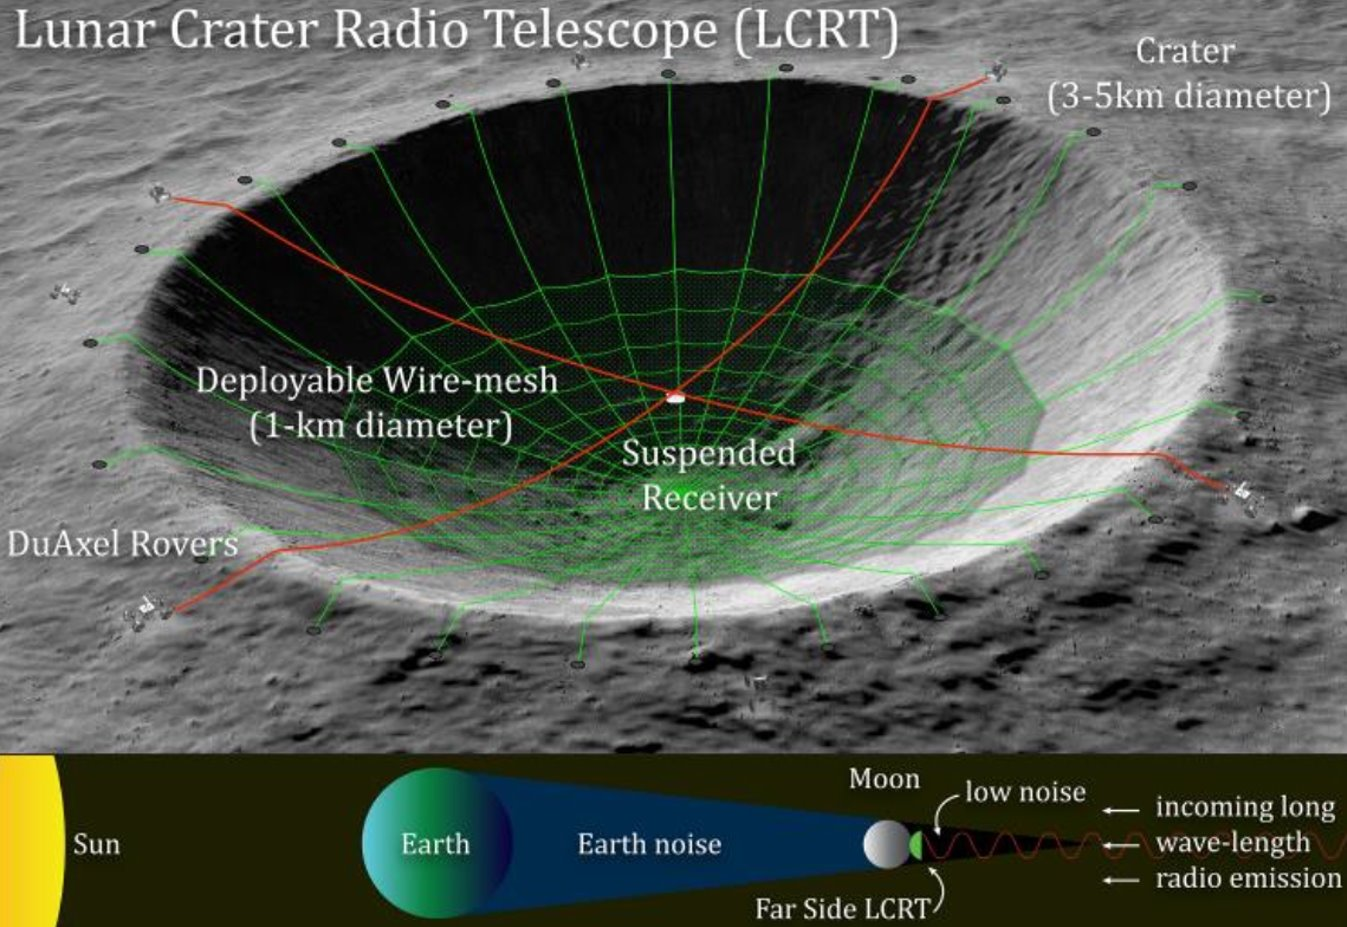 Radiotelescopio lunar LCRT  - FOTO: Saptarshi Bandyopadhyay